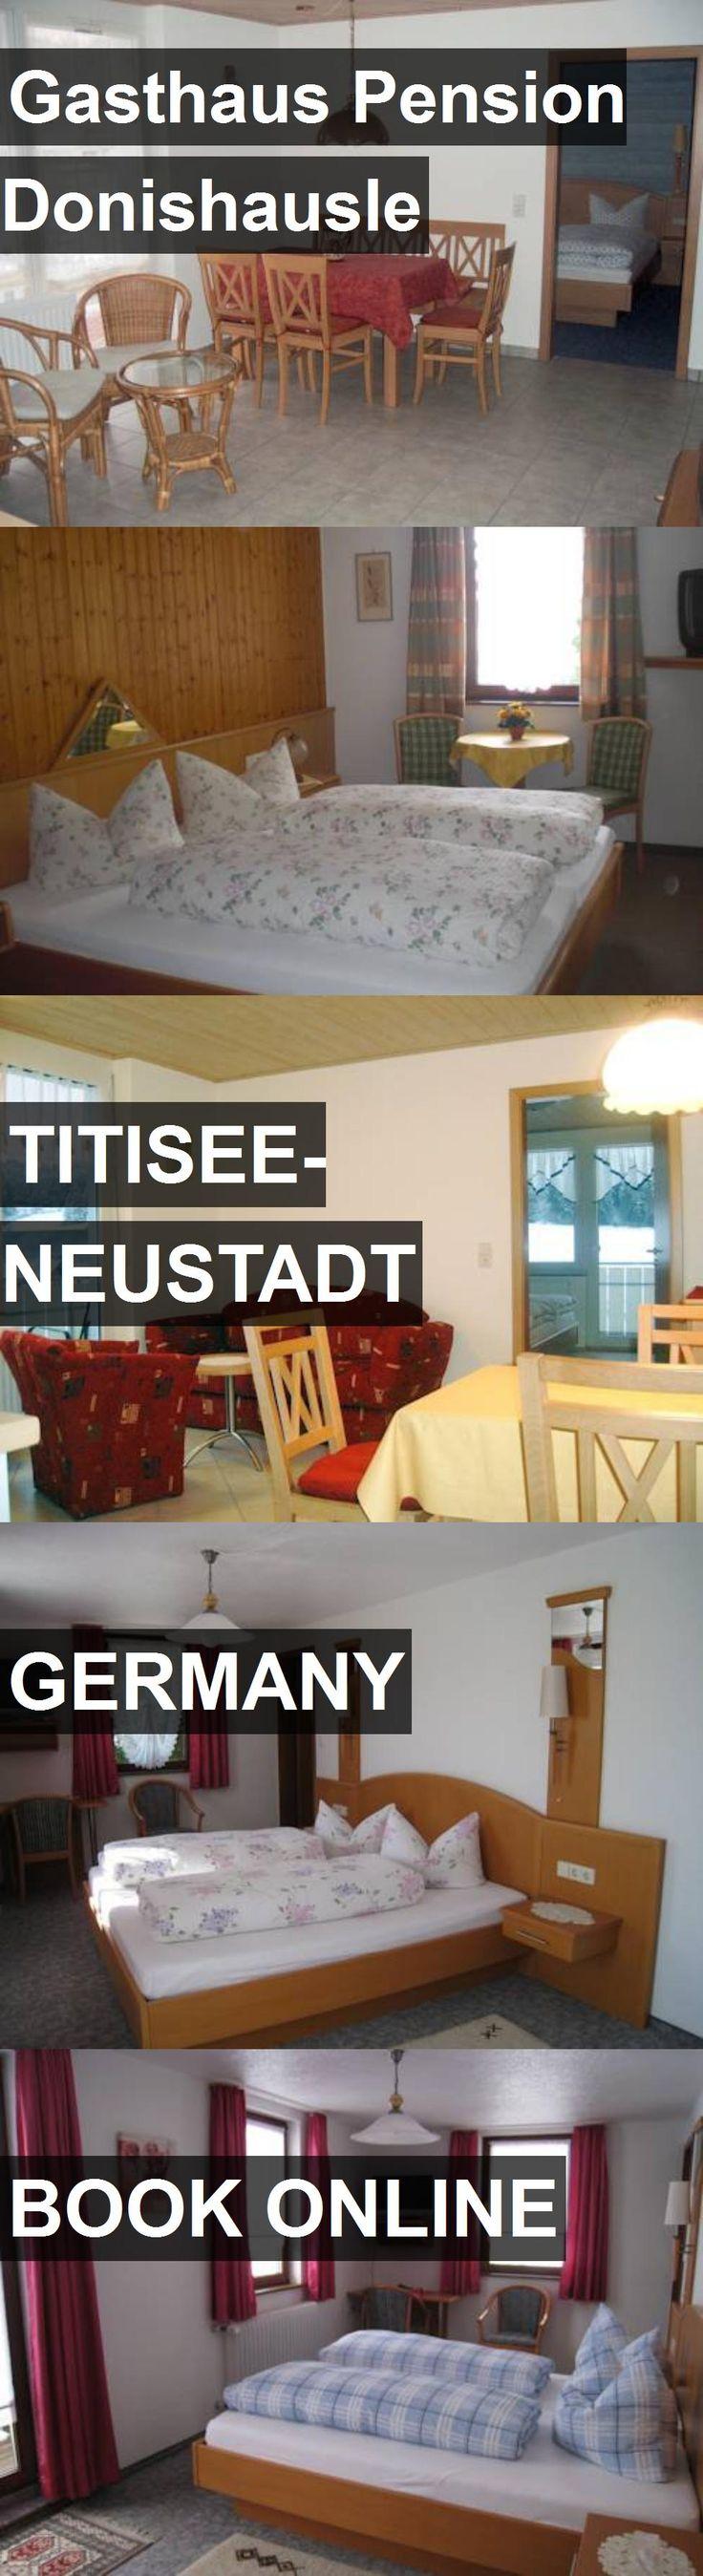 Berühmt Peaceful Inspiration Ideas Bad Krozingen Hotel Bilder